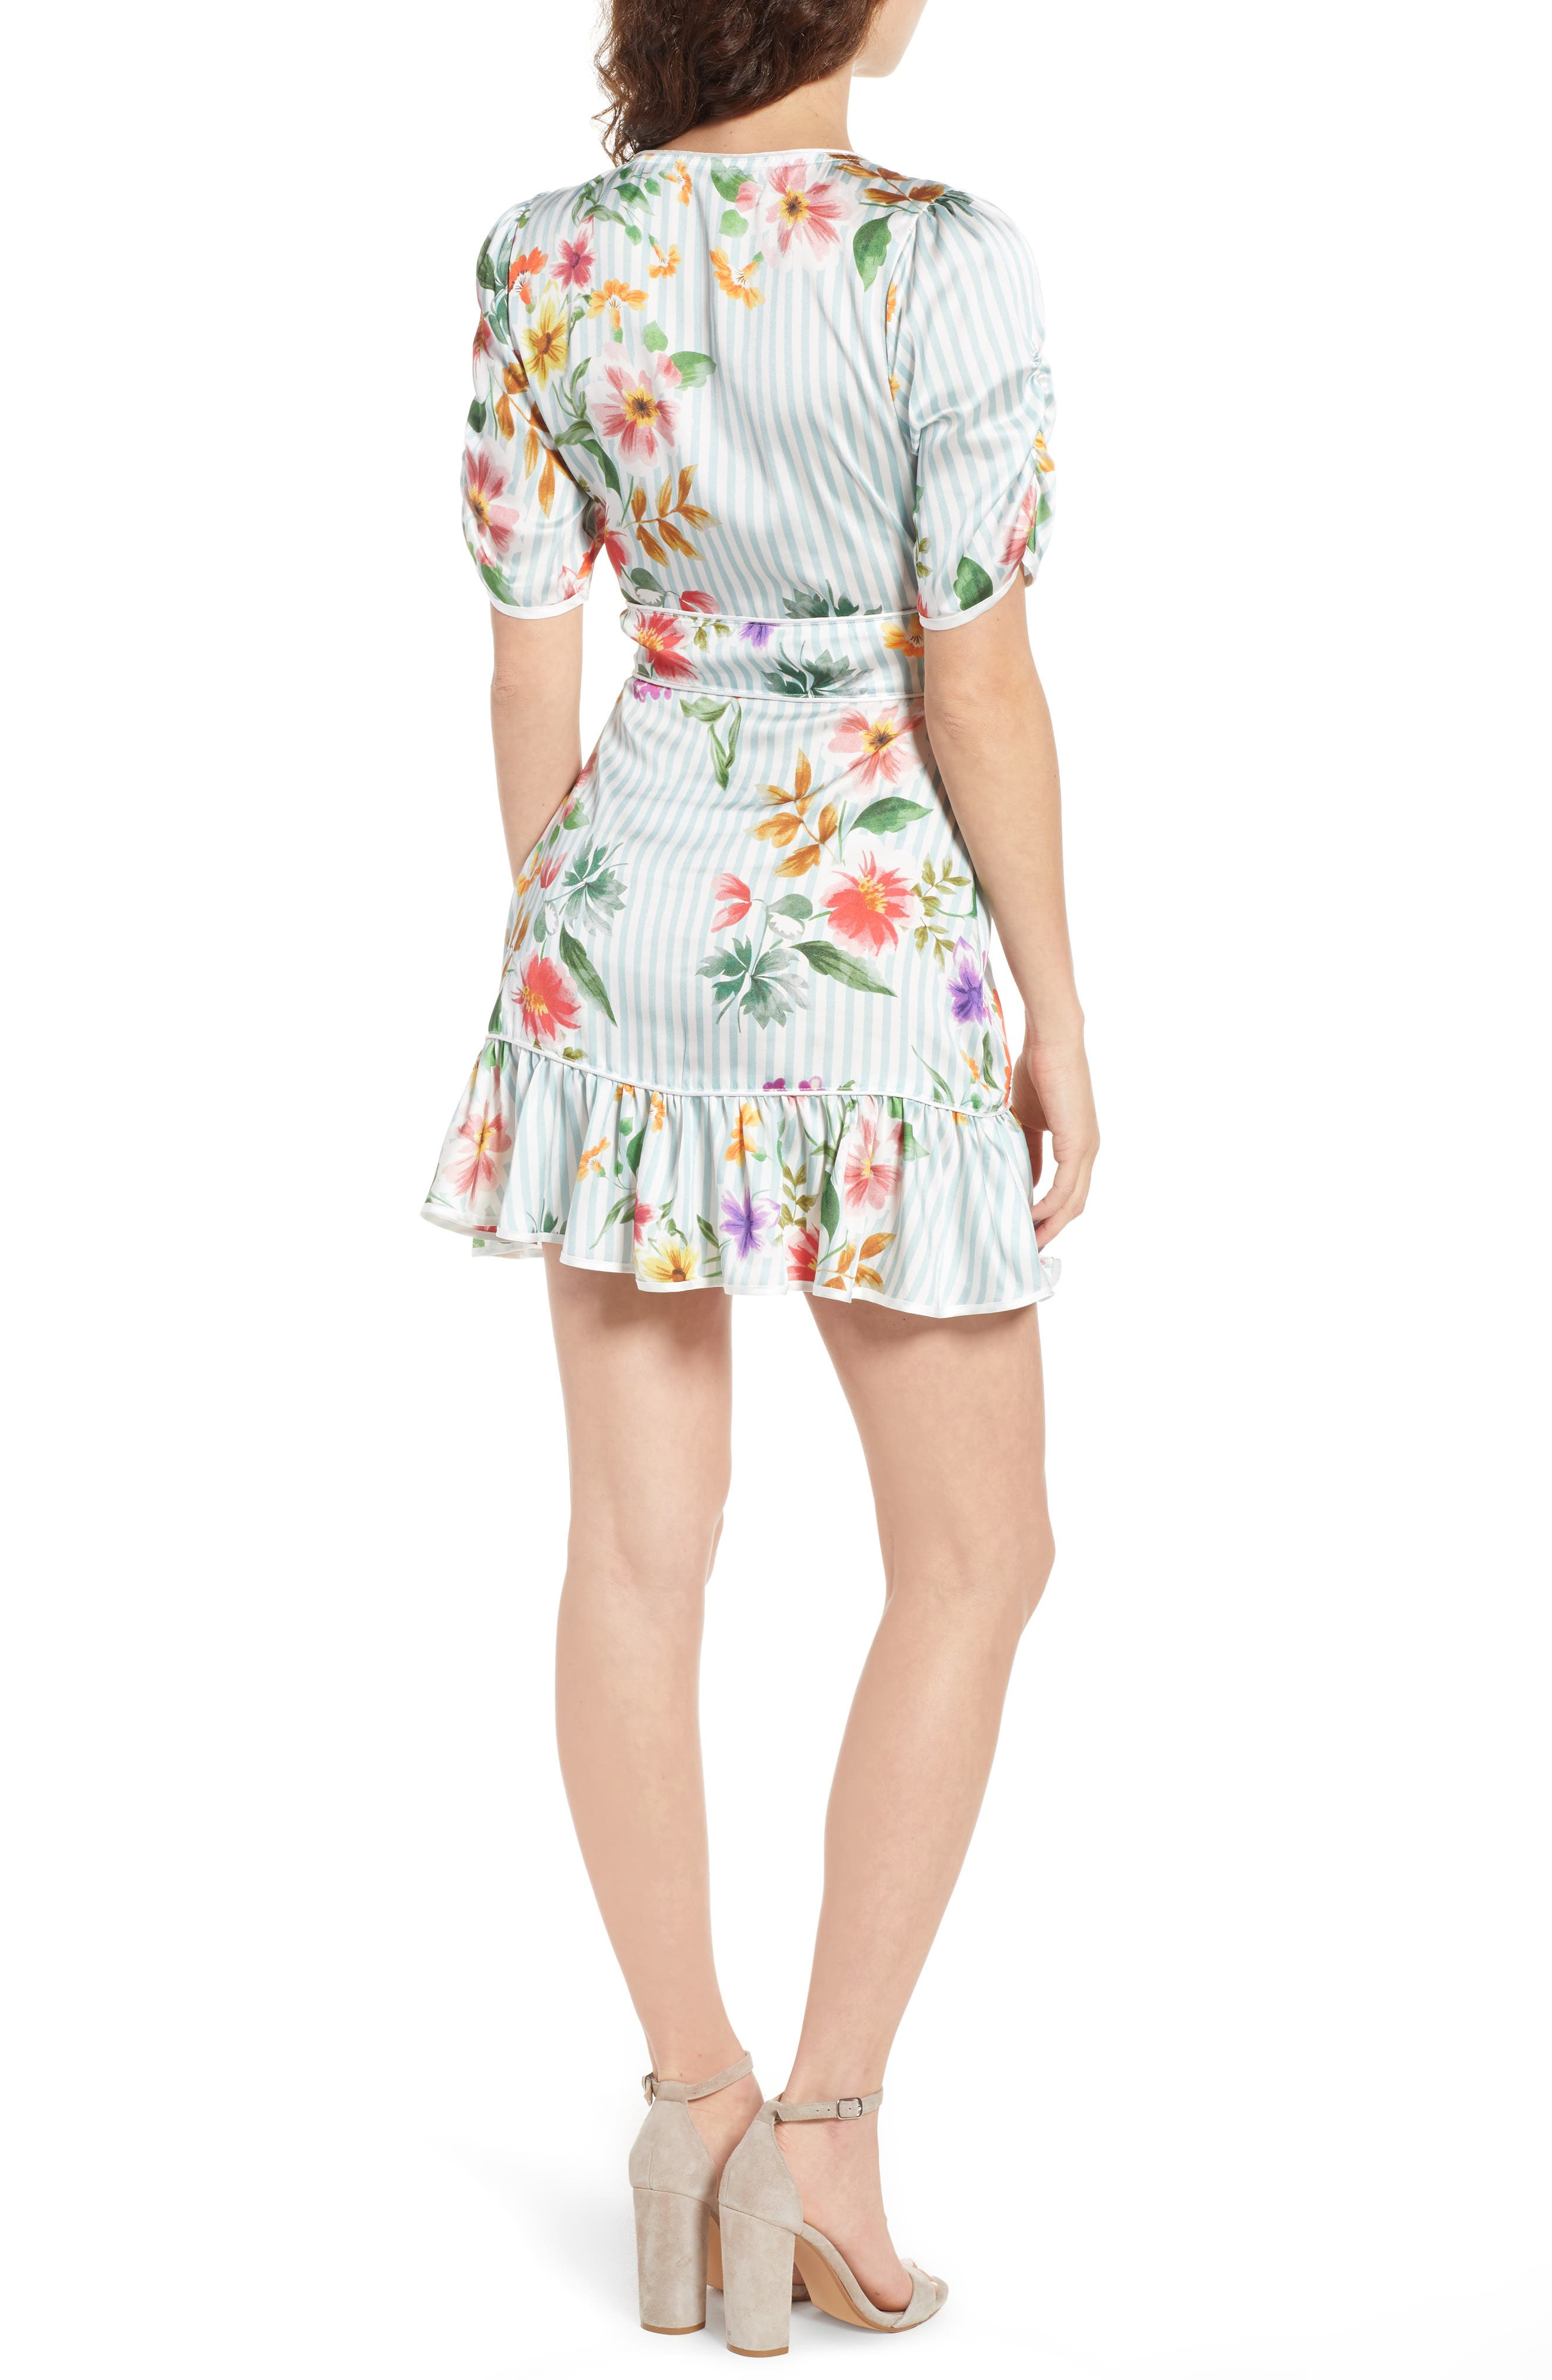 Barb Ruffle Dress,                             Alternate thumbnail 2, color,                             Blue Flowerbed